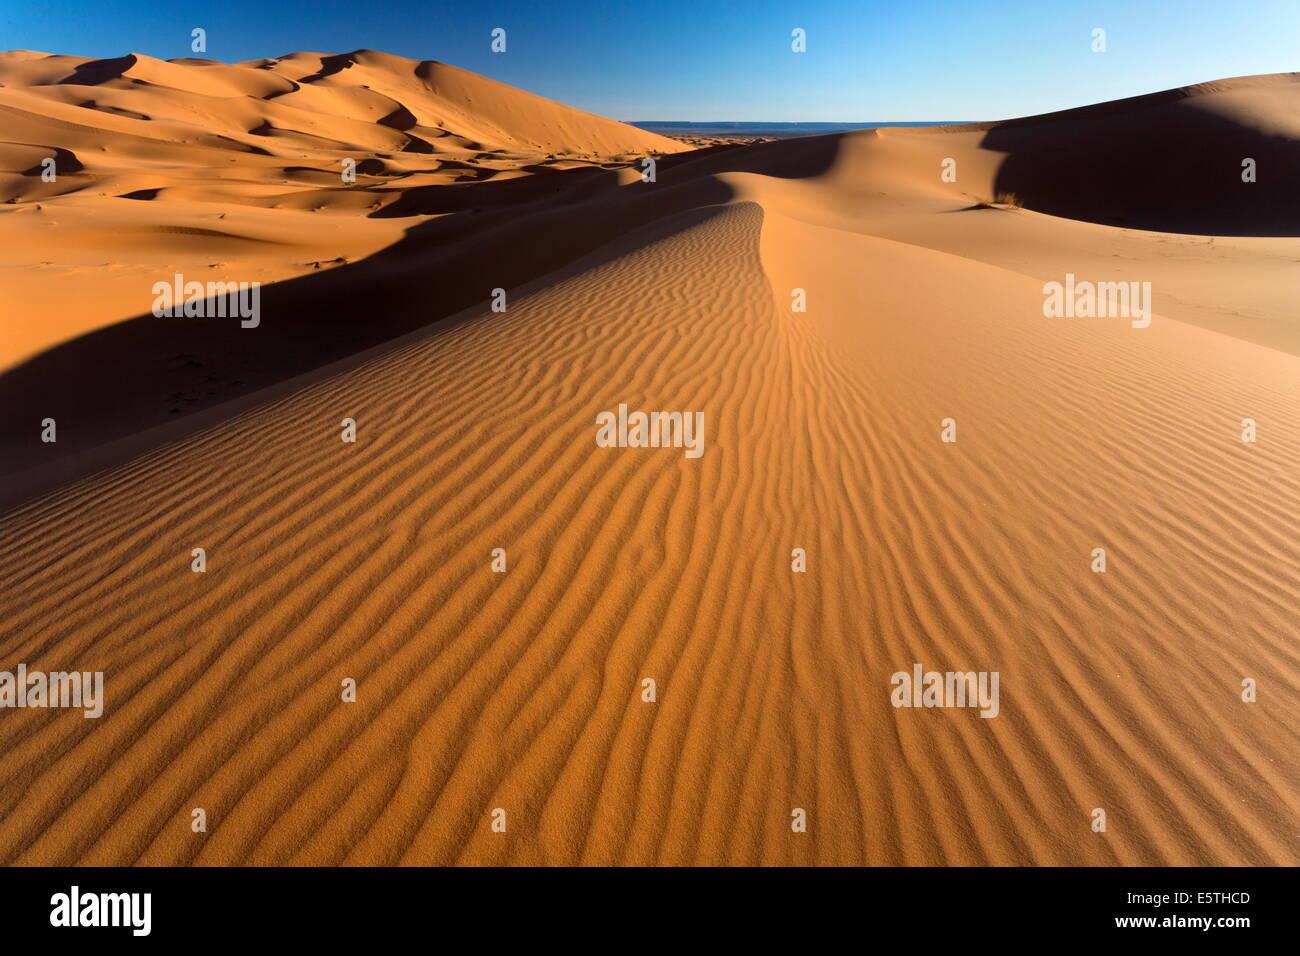 Orange sand dunes and sand ripples, Erg Chebbi sand sea, Sahara Desert near Merzouga, Morocco, North Africa, Africa Stock Photo